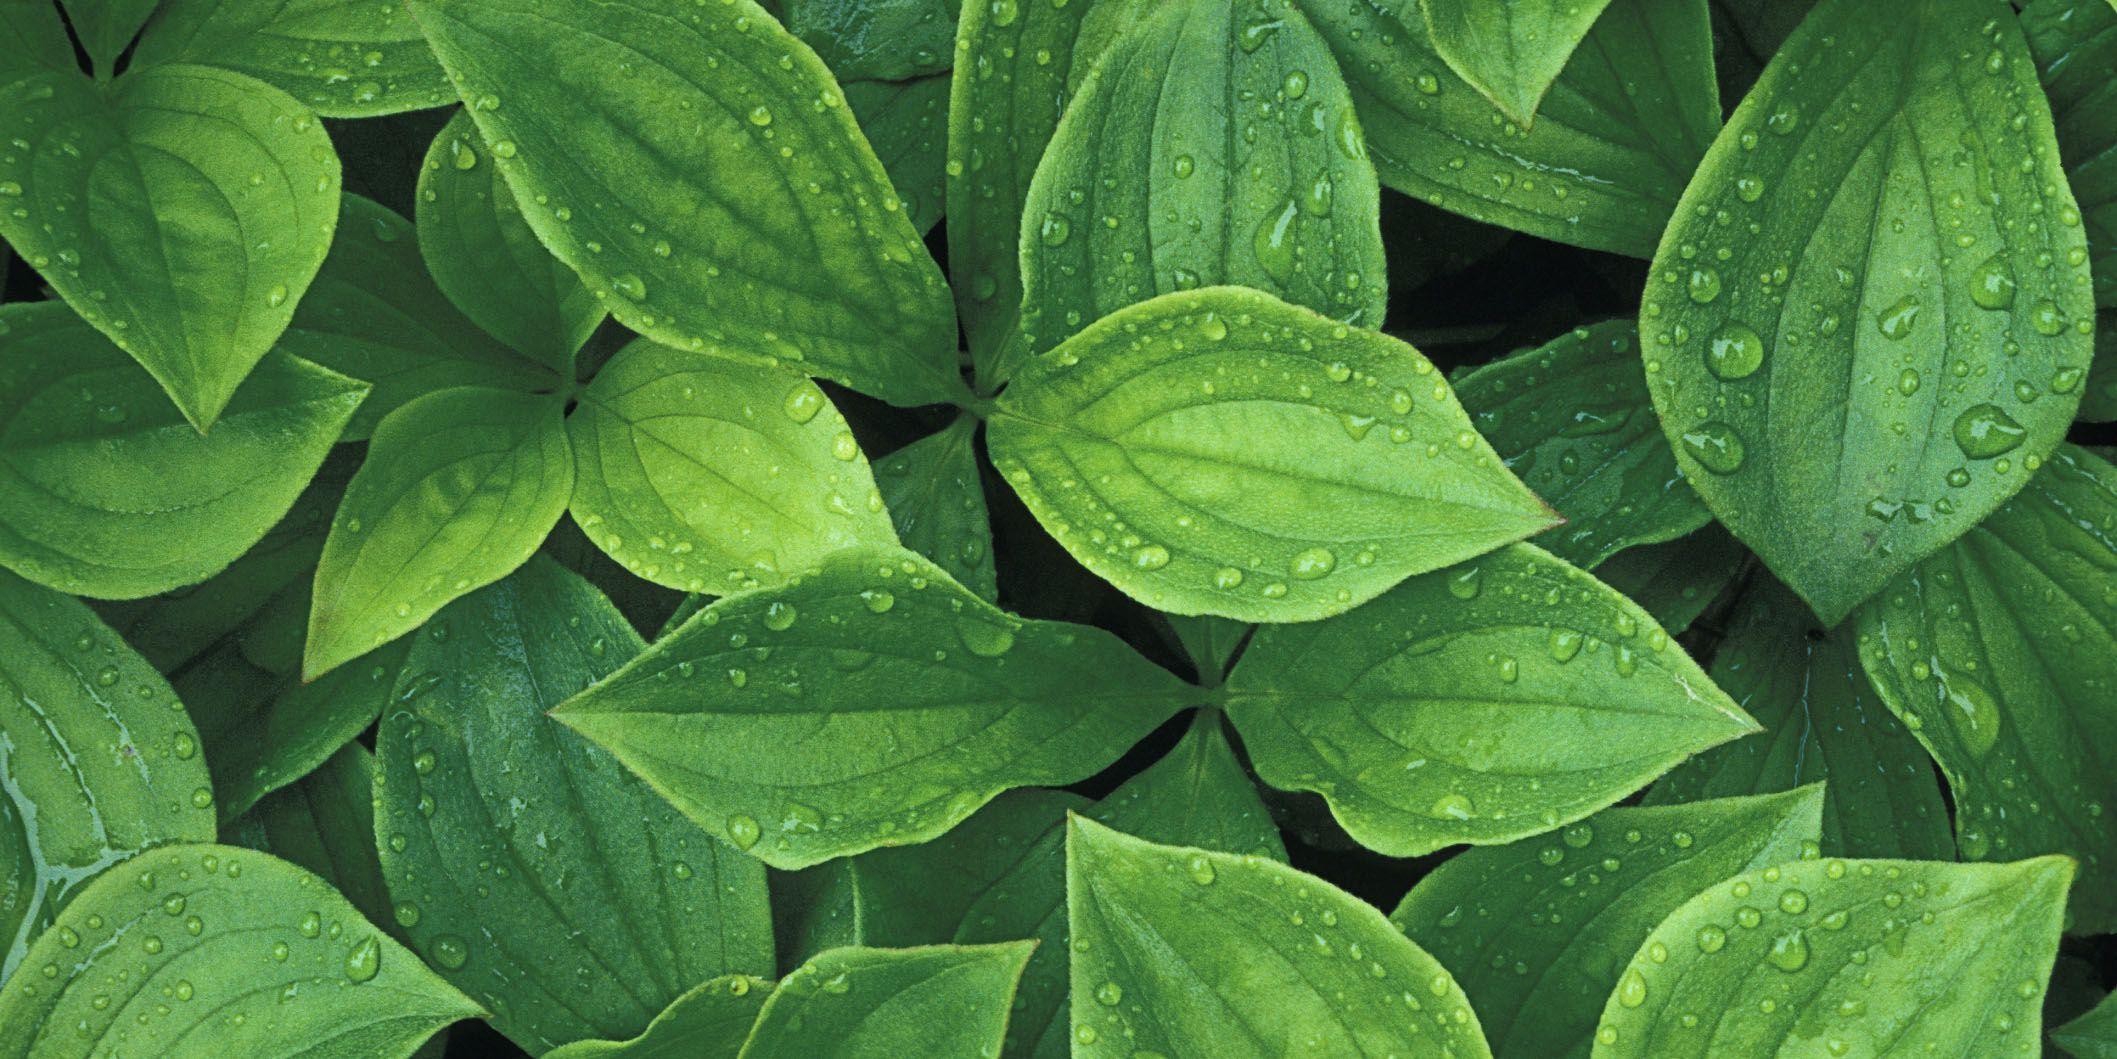 1439490128-plants.jpg